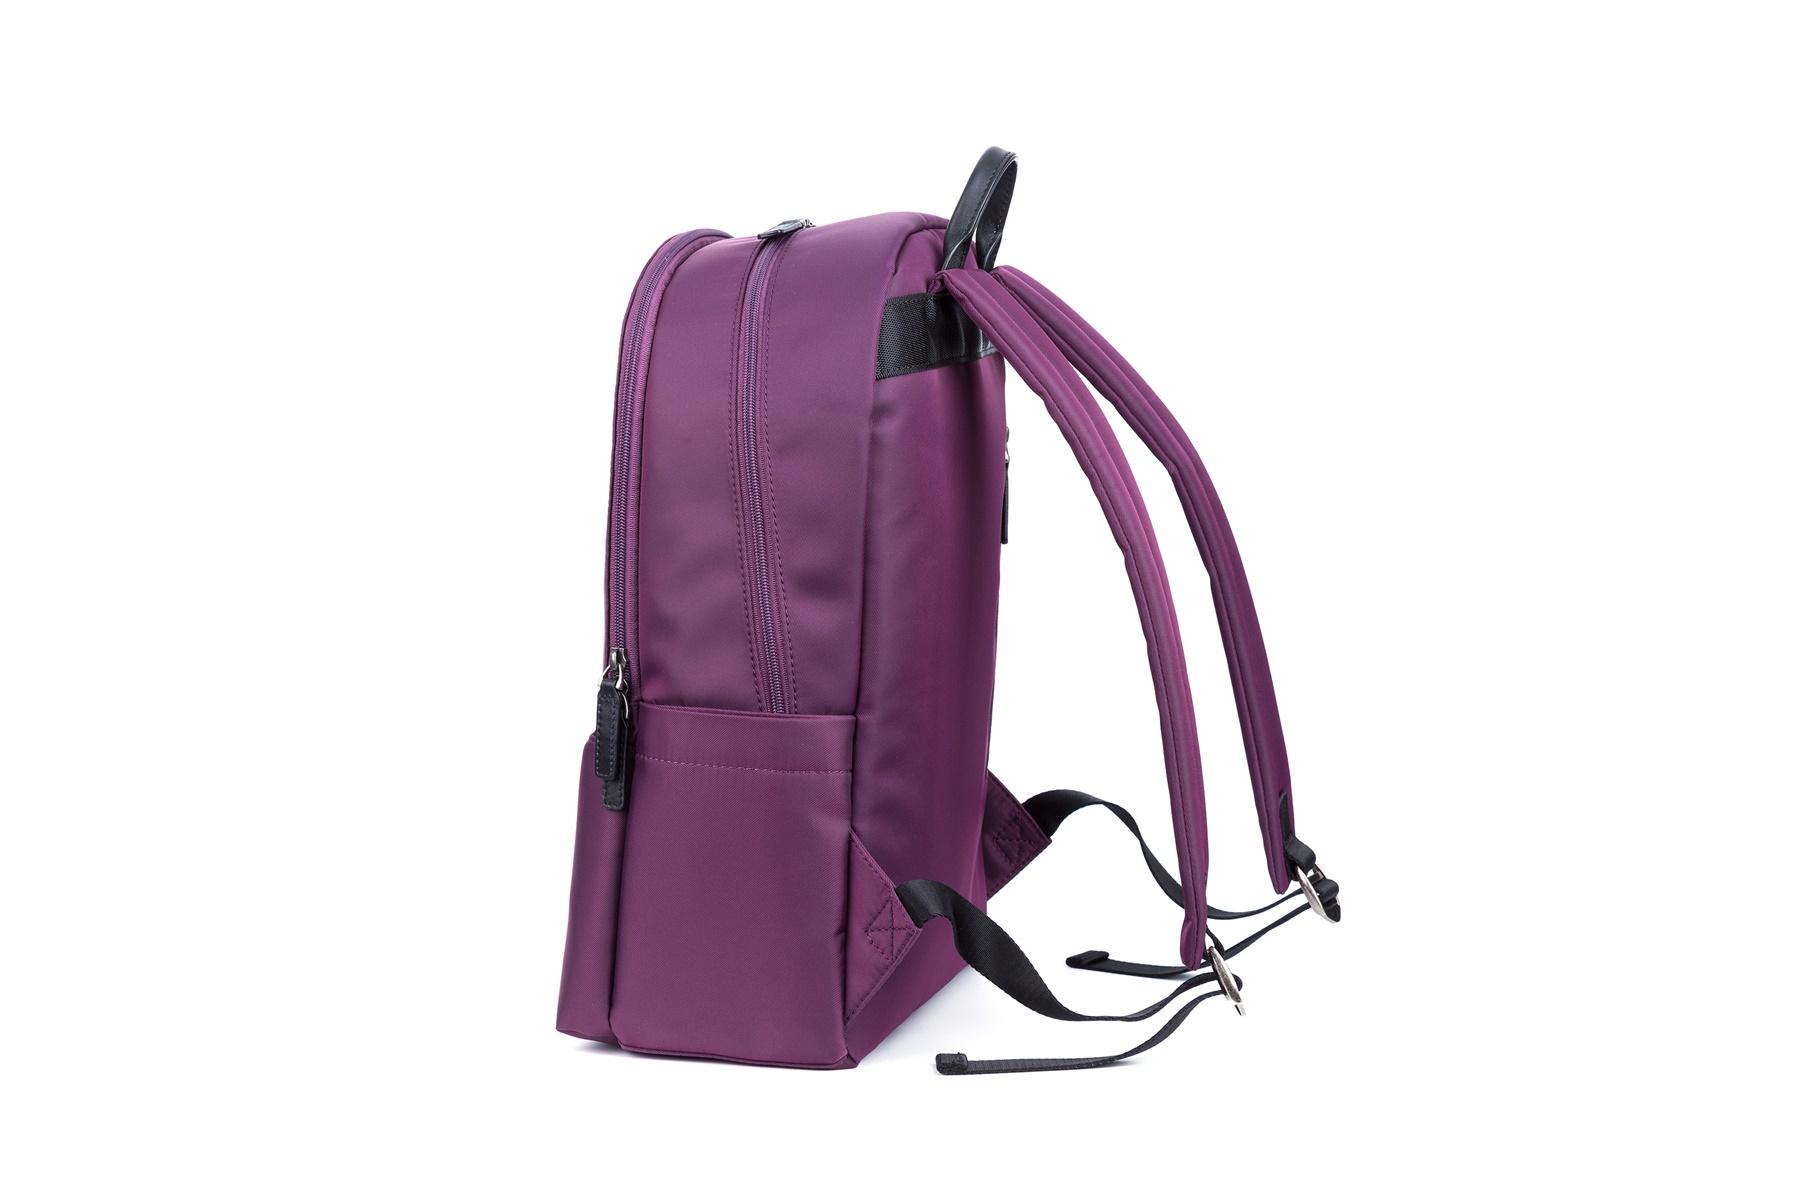 GF bags-Professional Stylish Backpacks Big Backpack Bags Manufacture-2